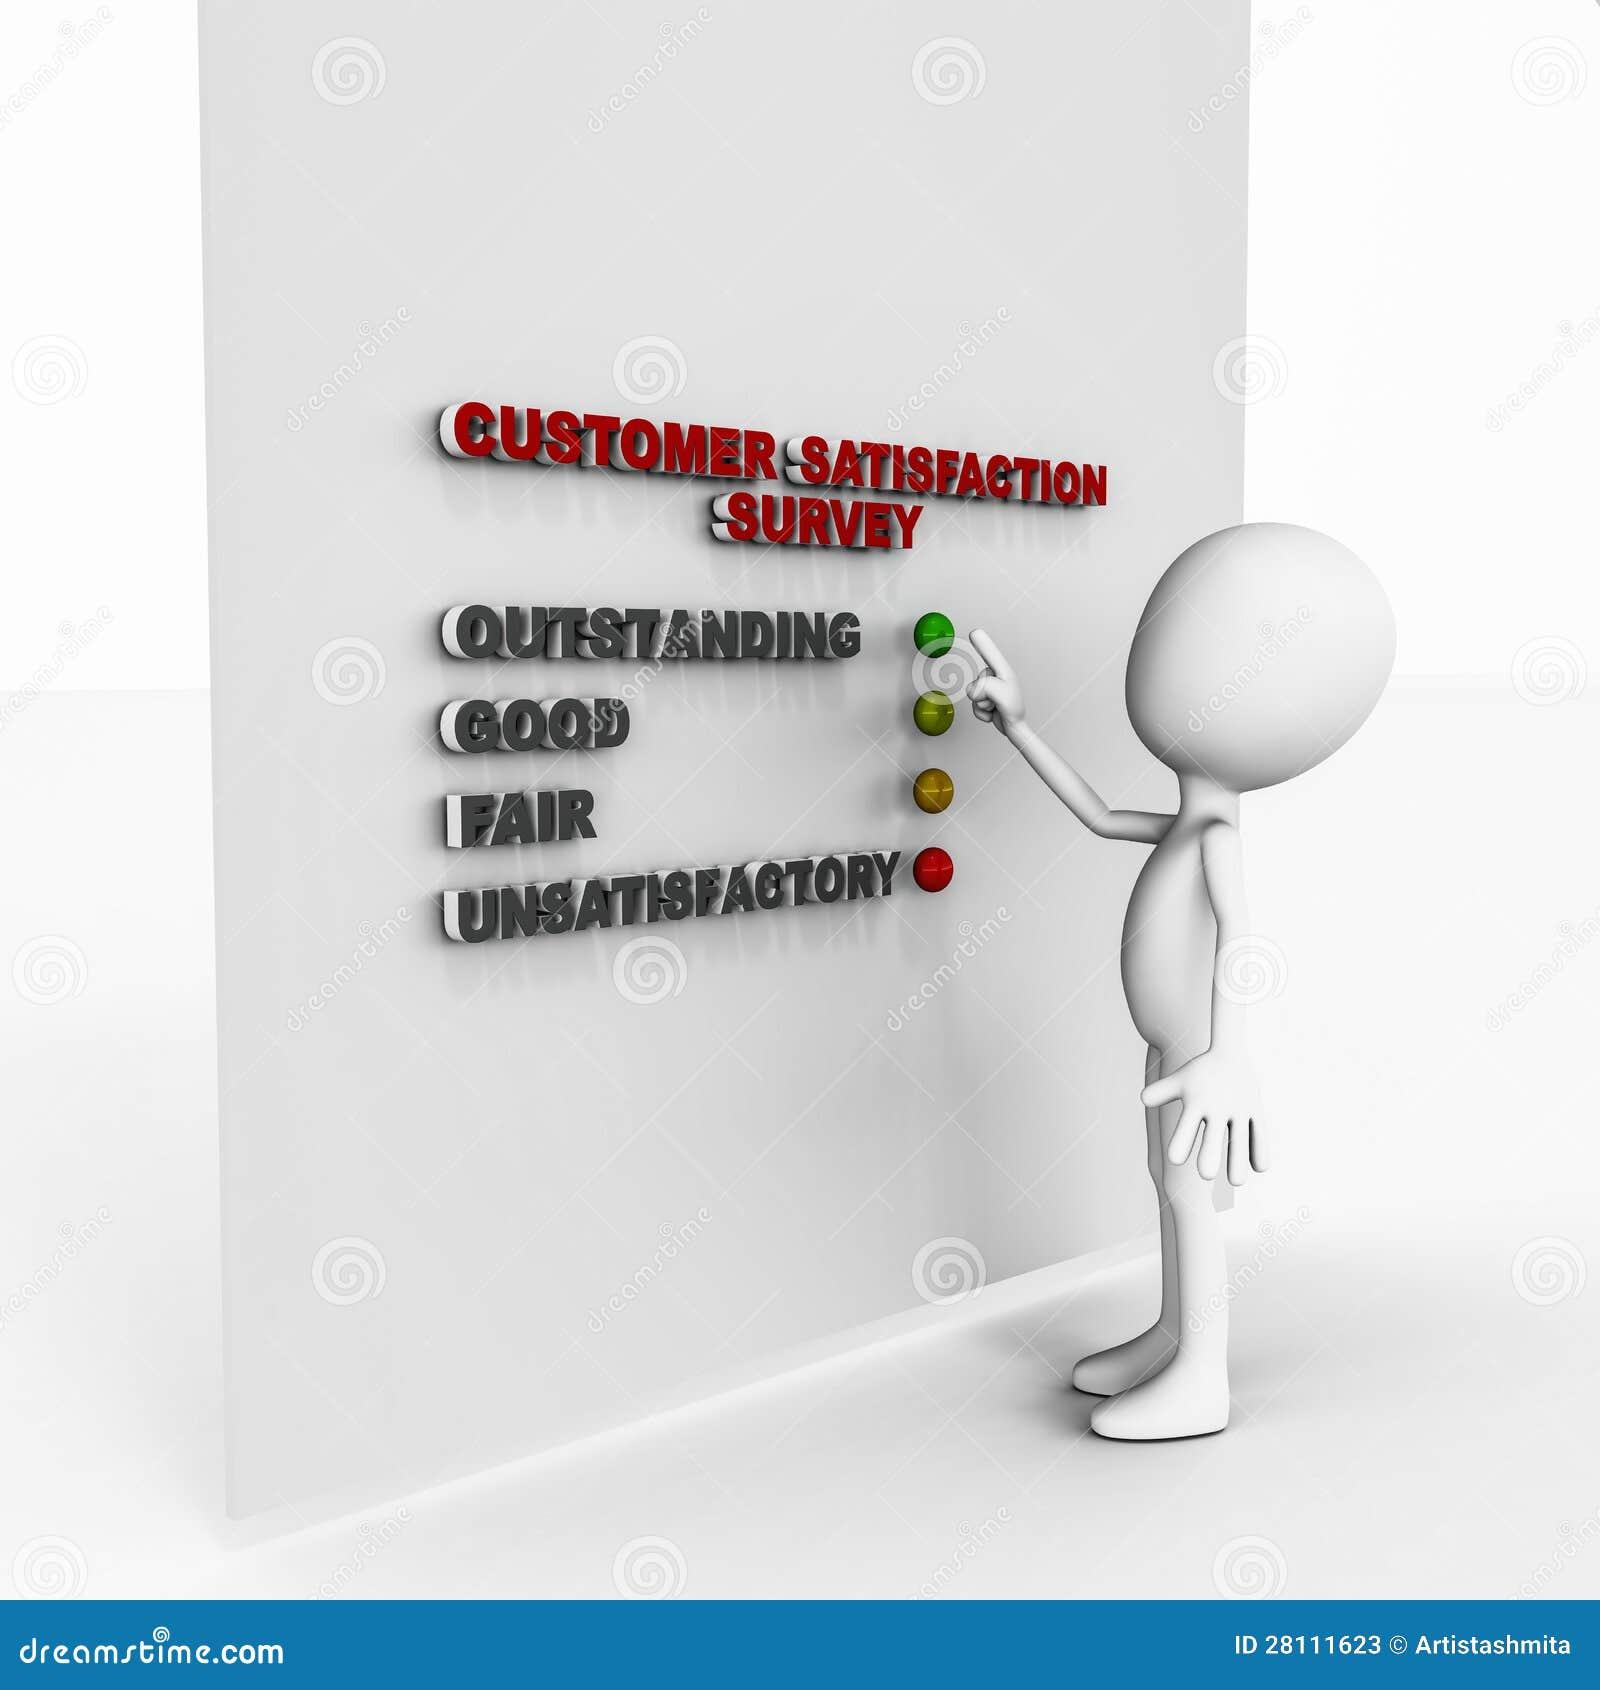 Customer Satisfaction Survey Photos Image 28111623 – Customer Satisfaction Survey